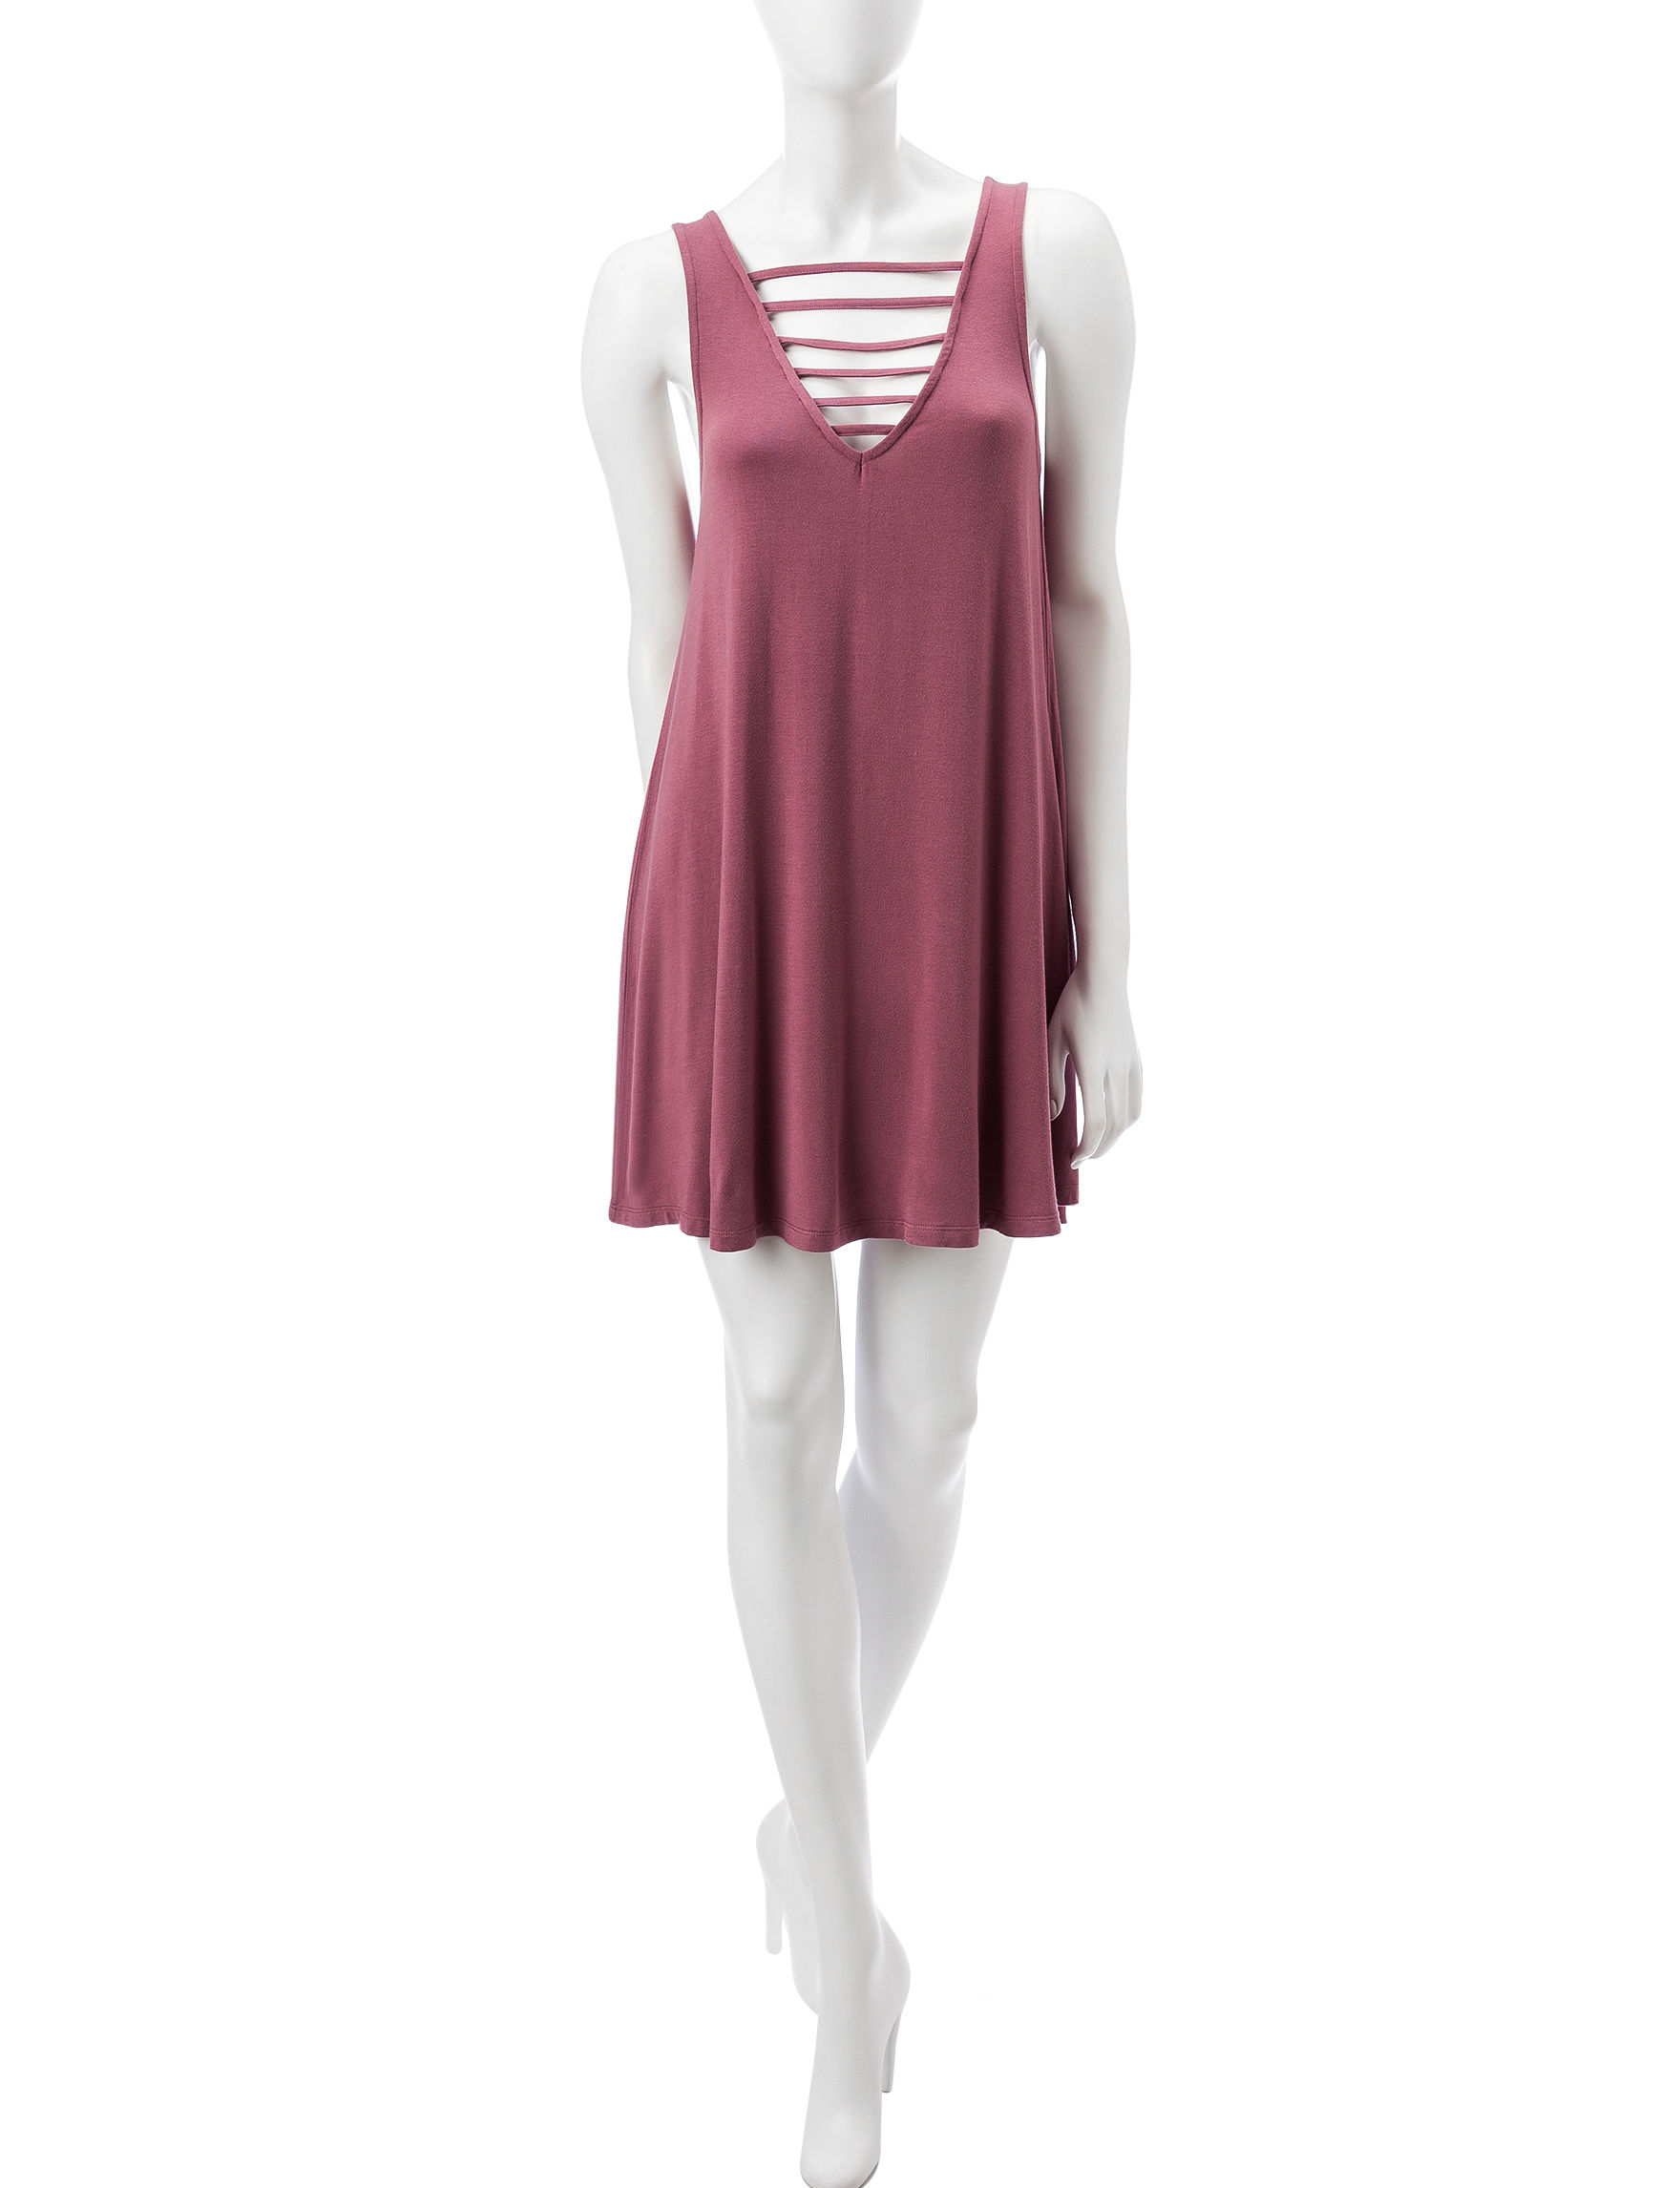 Wishful Park Mauve Everyday & Casual Shift Dresses